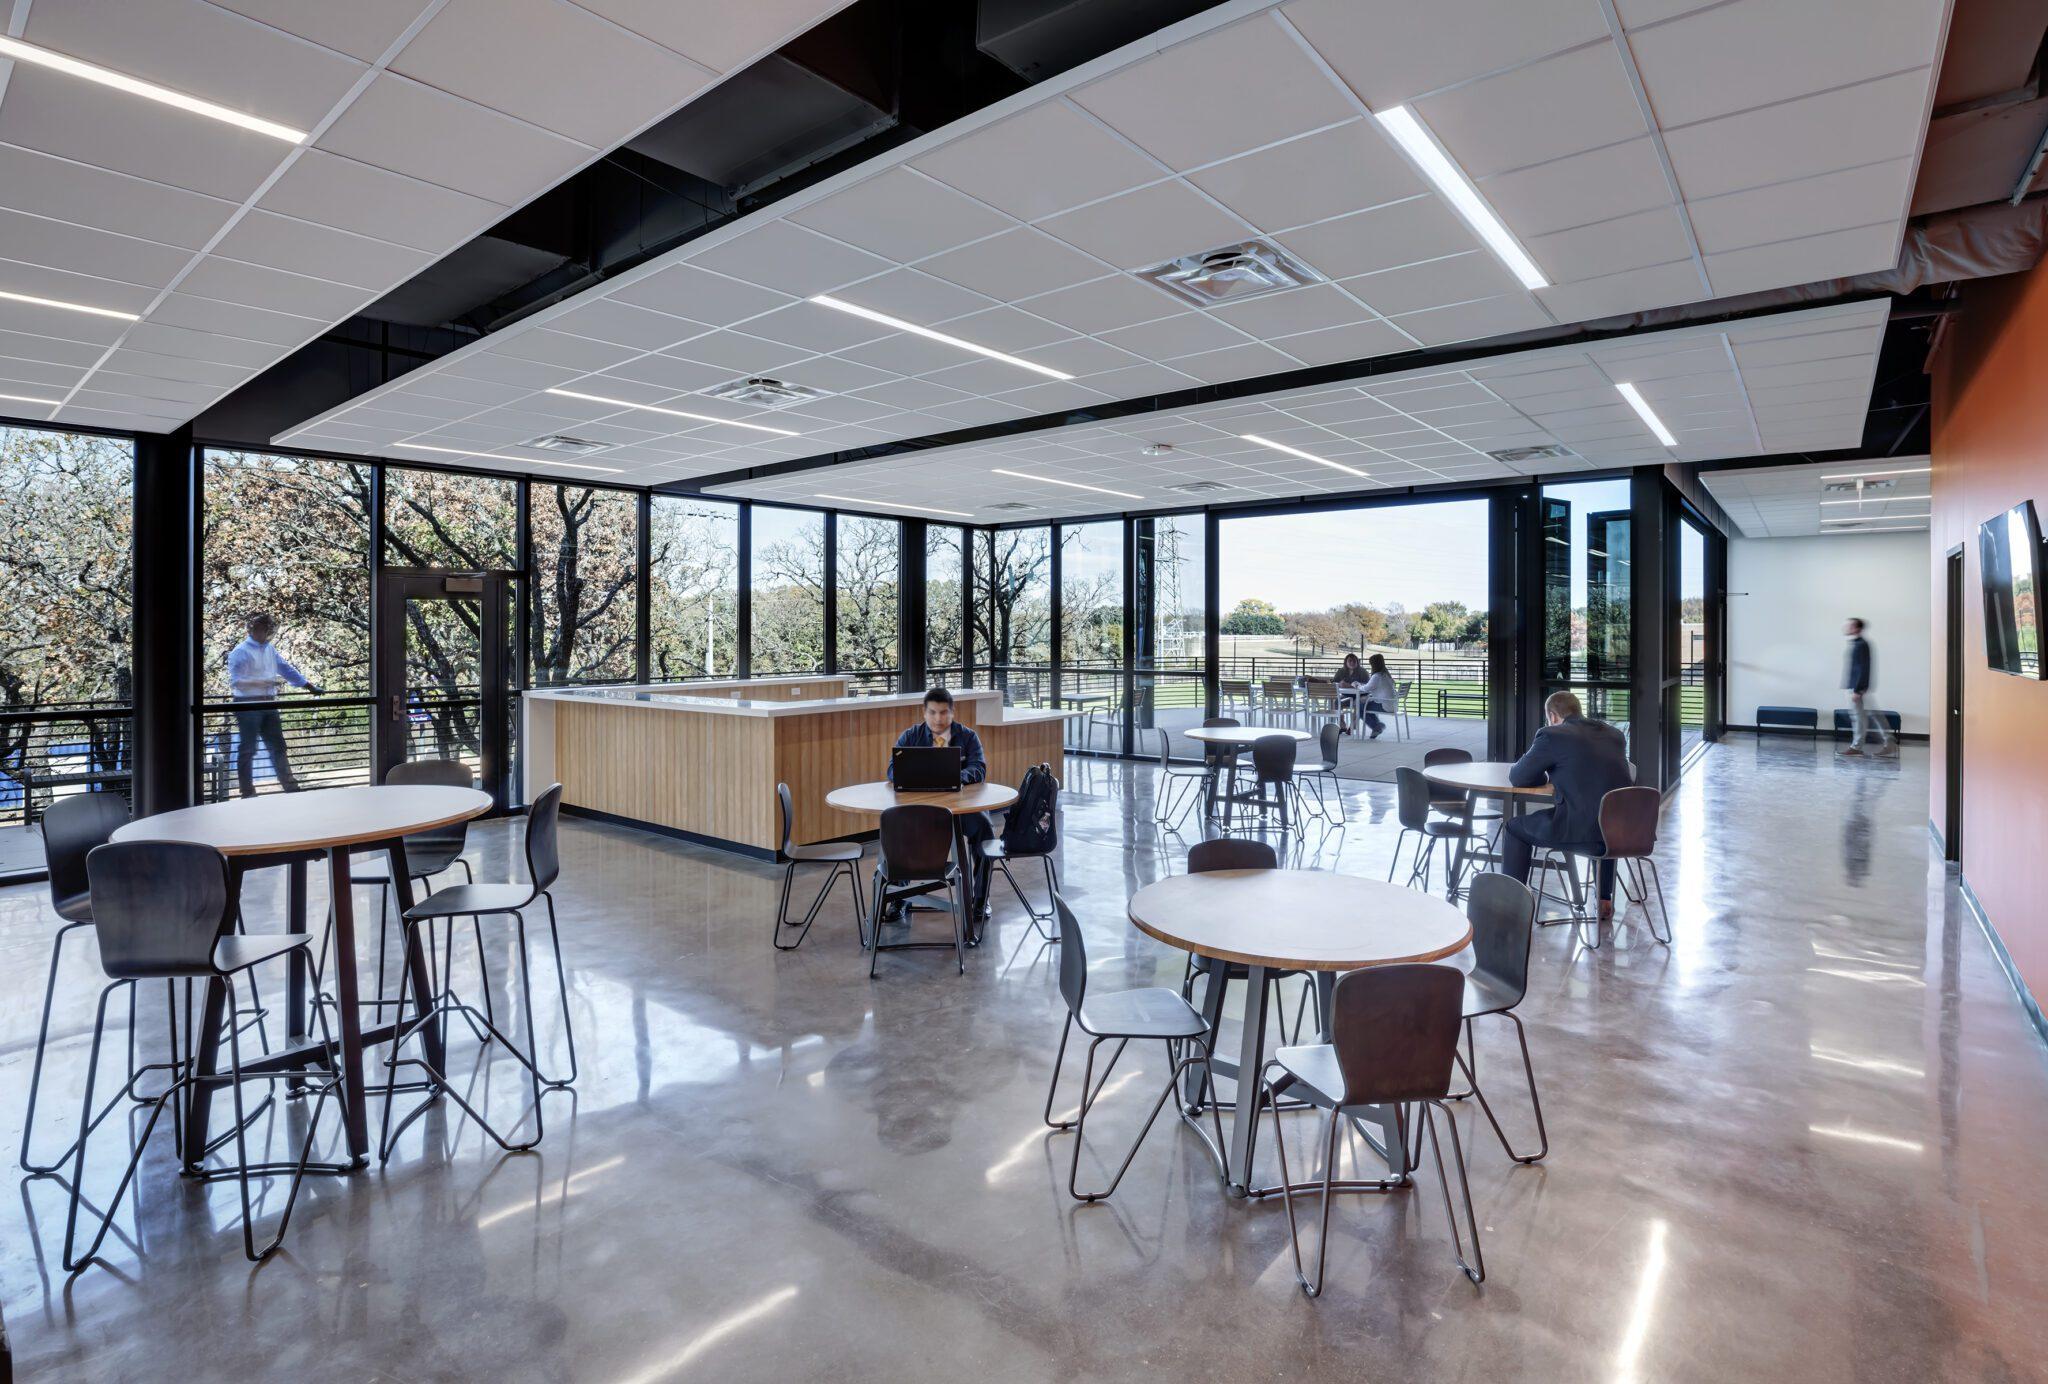 Cristo Rey Dallas Innovation Center, 2nd Floor Seating